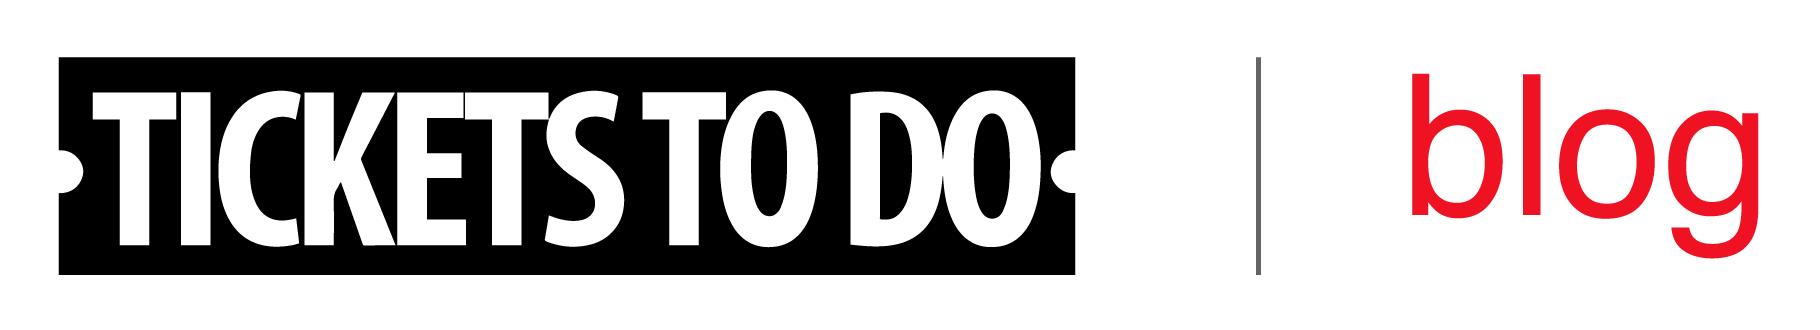 TicketsToDo Blog